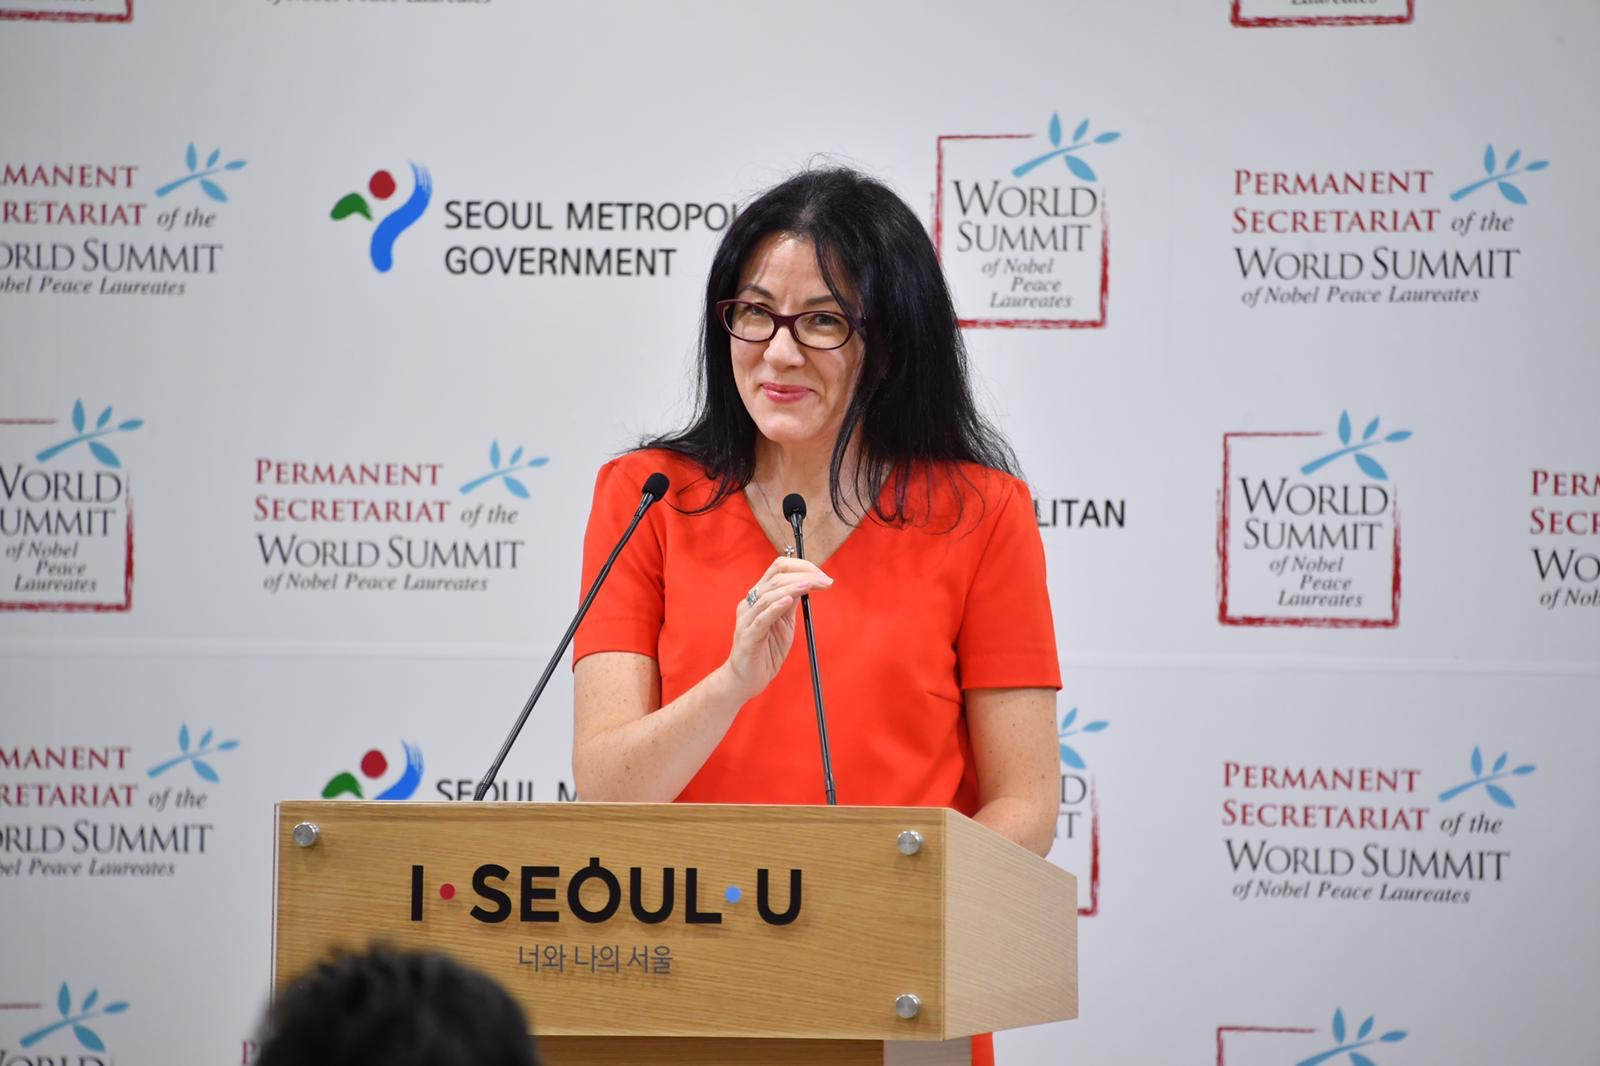 Statement: Mayor of Seoul